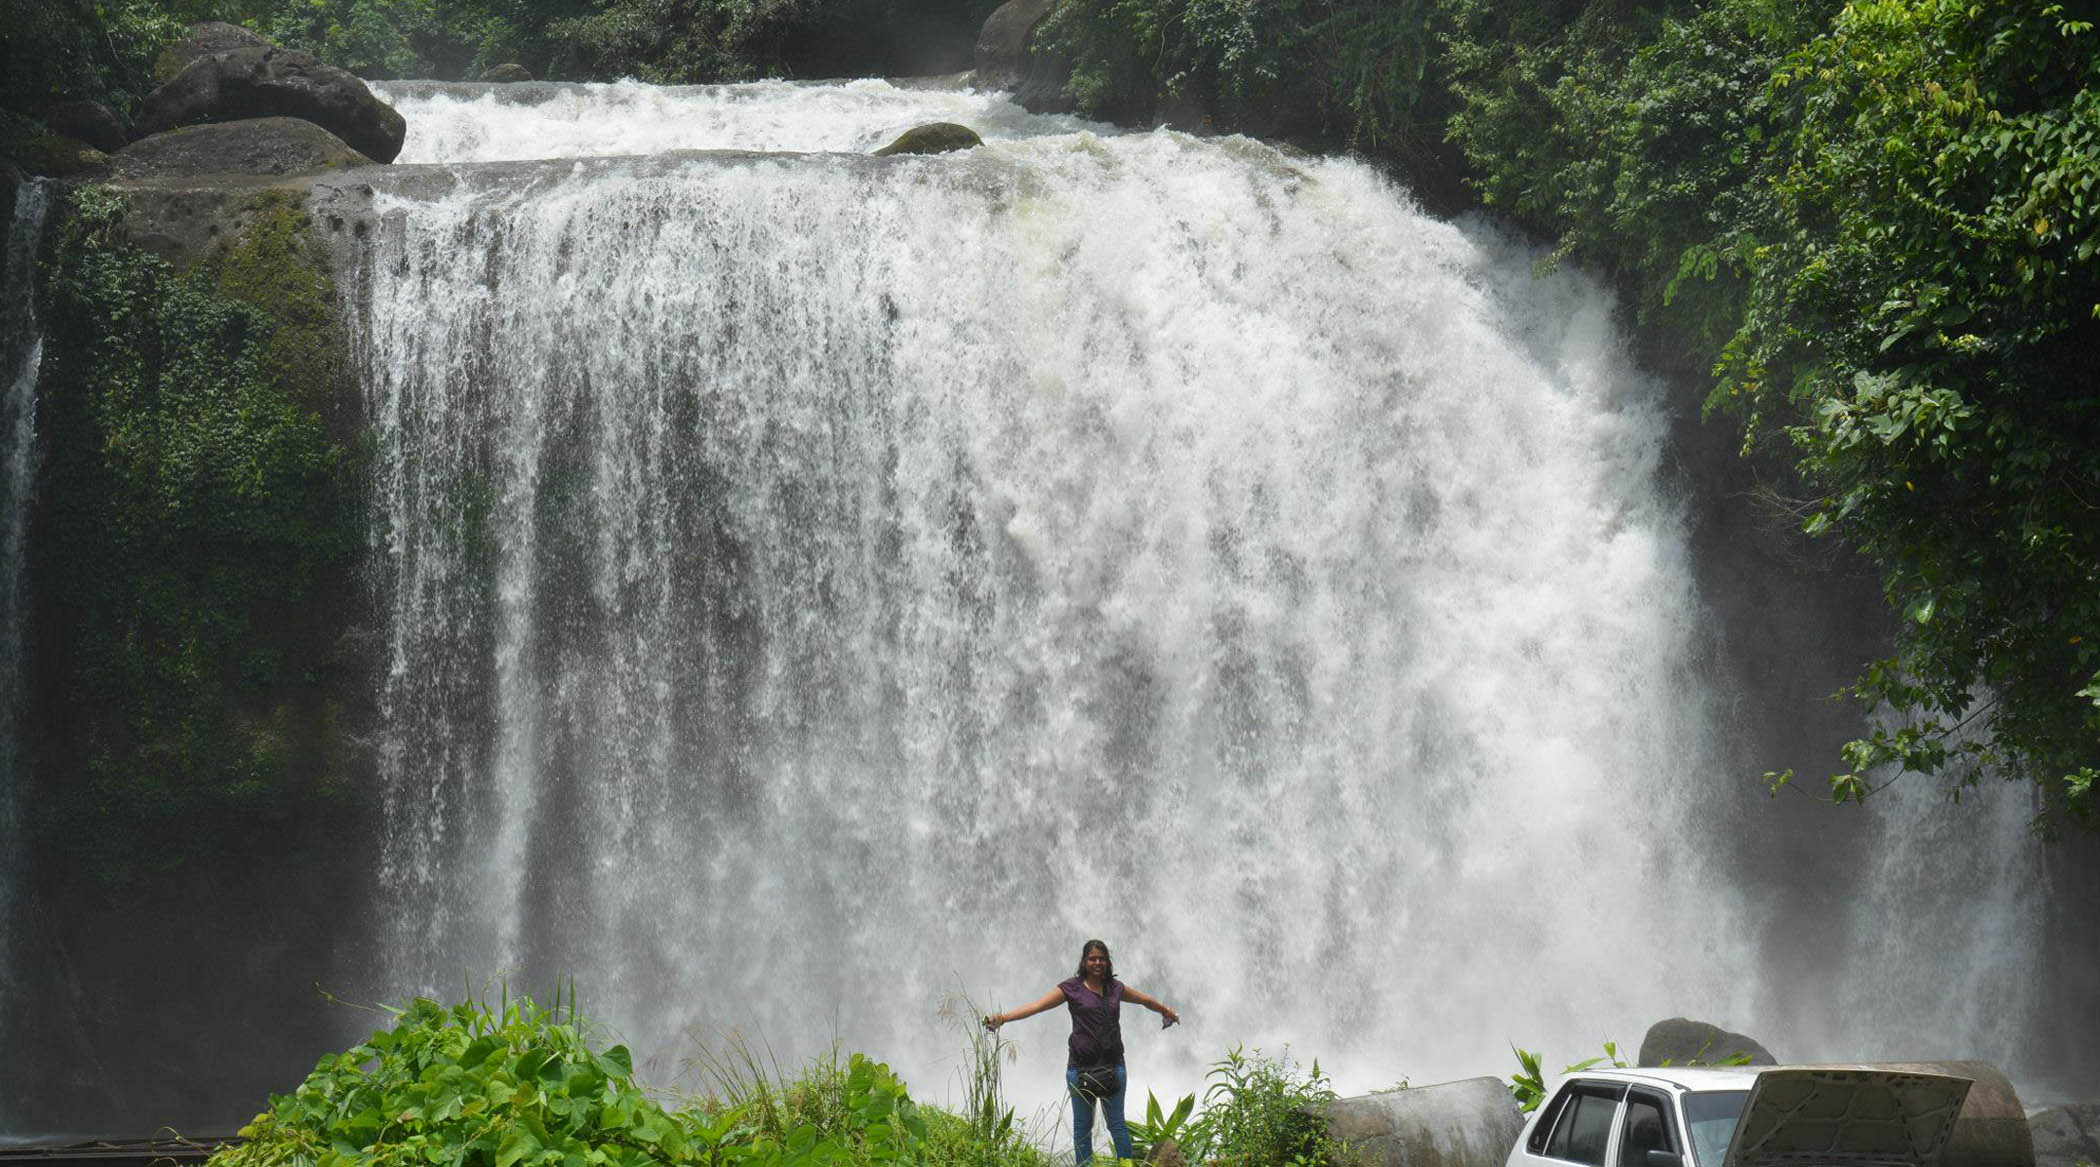 Visit Mawlynnong Waterfalls in Mawlynnong Village